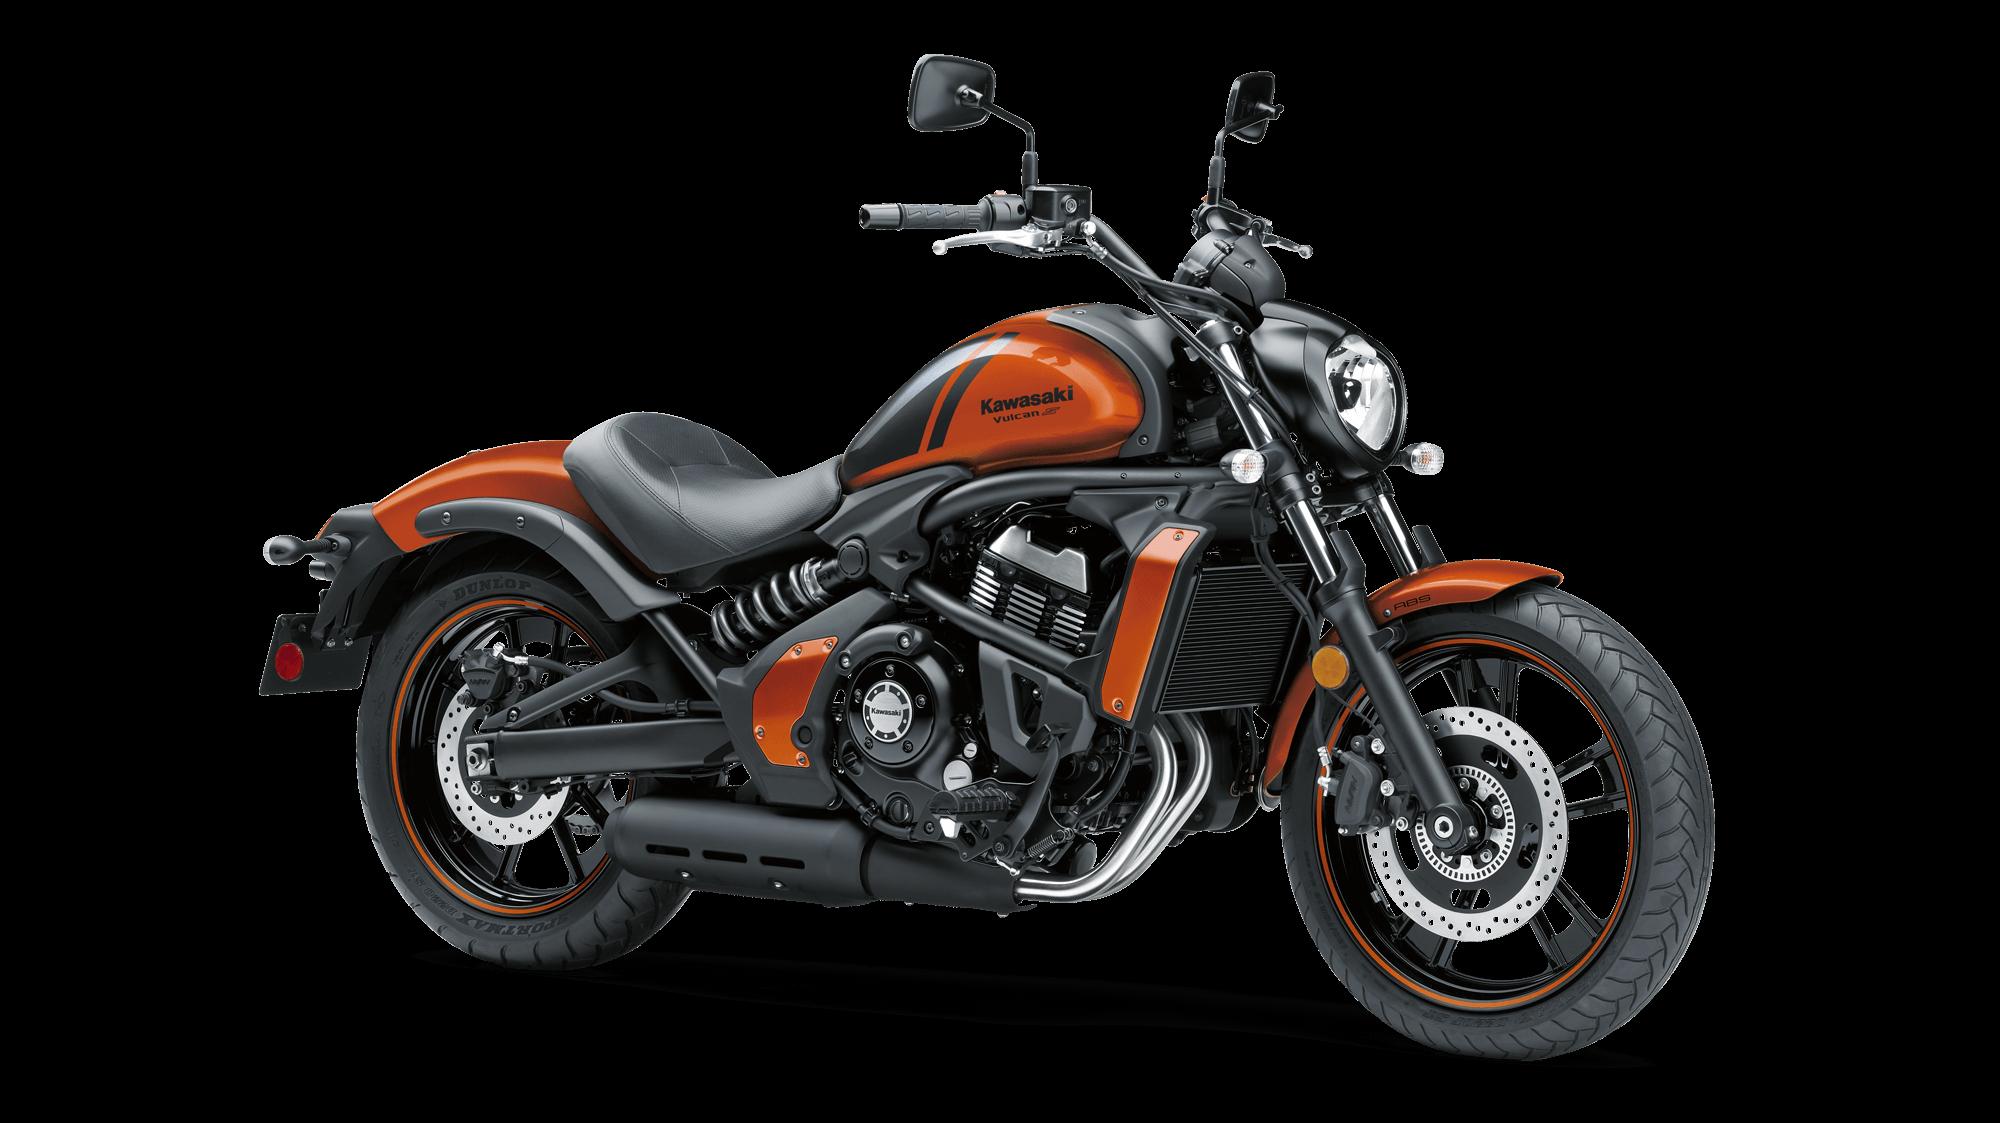 2018 vulcan s abs se cruisers motorcycle by kawasaki. Black Bedroom Furniture Sets. Home Design Ideas